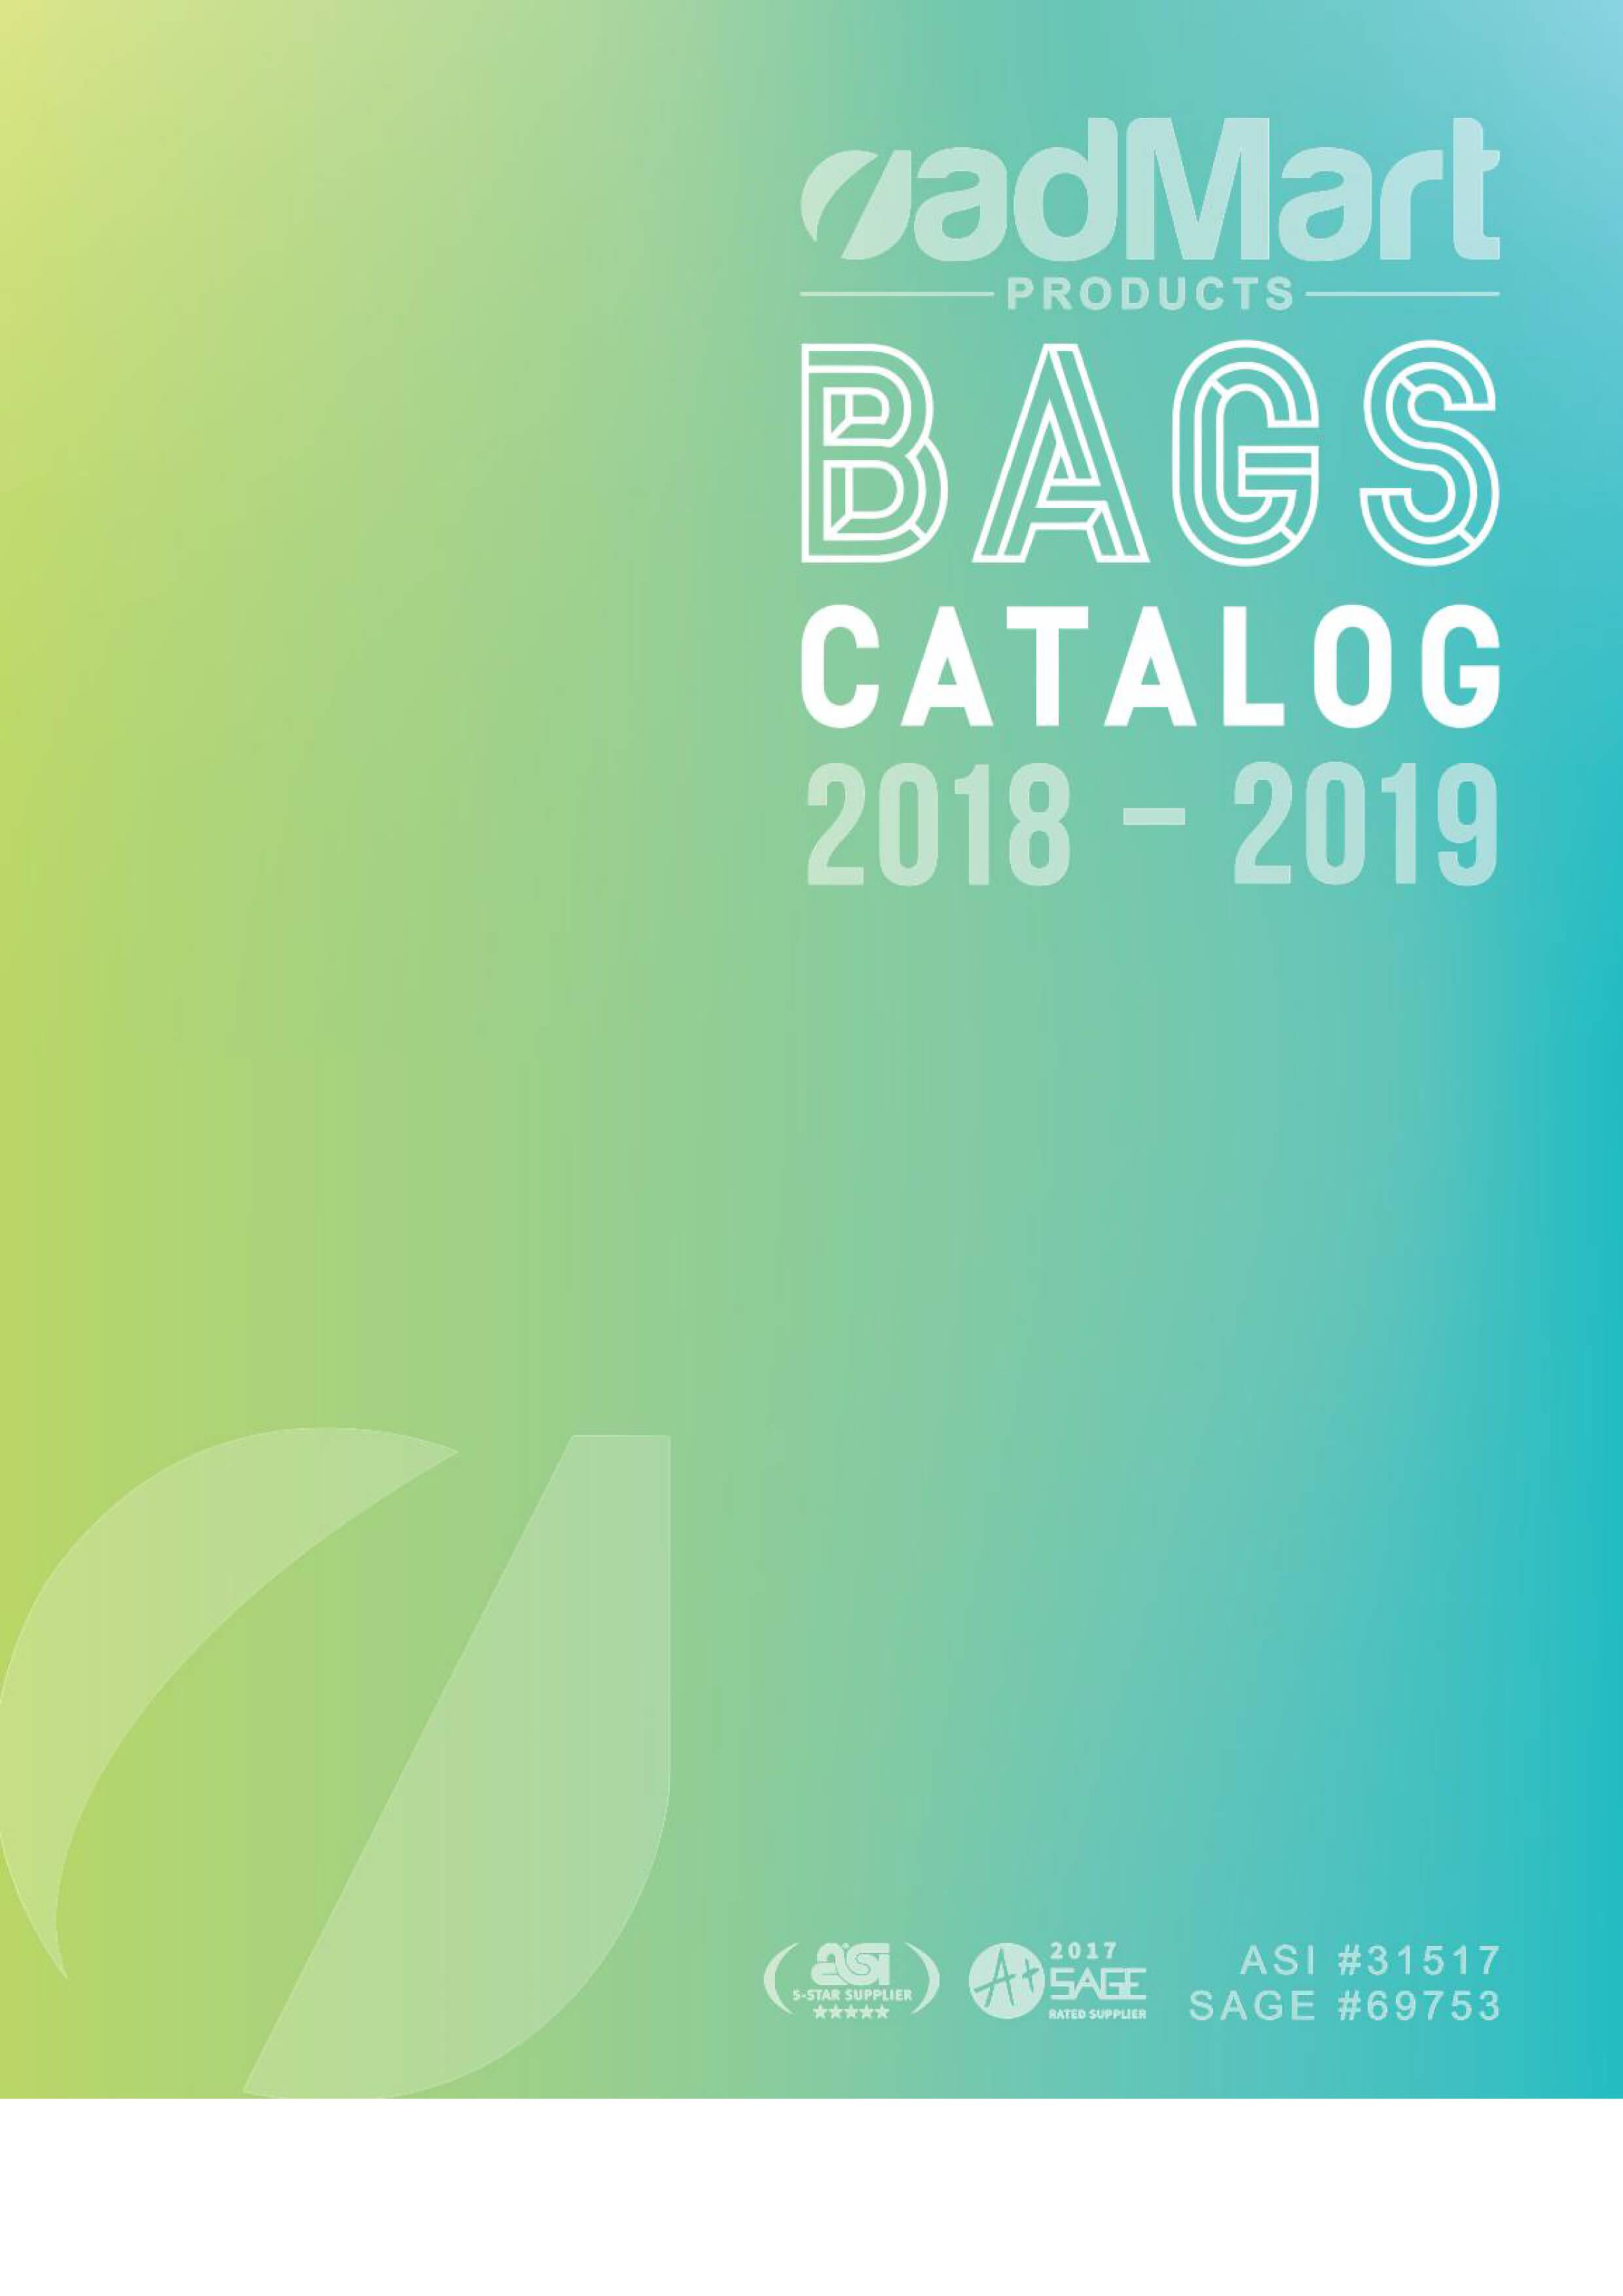 Bags Catalog 2018-2019